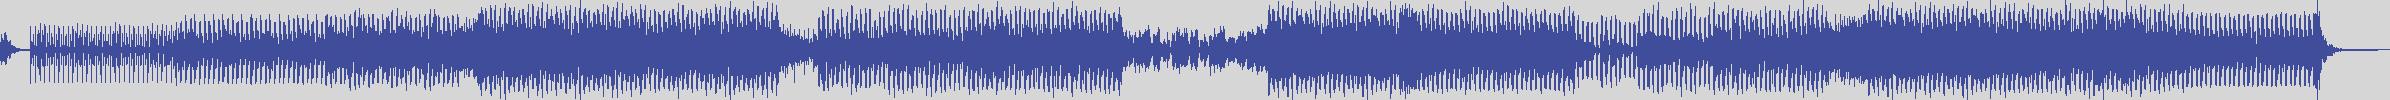 just_digital_records [JS1406] Sugar Freak - Music Change My Life [Lys Vocal  Radio Cut] audio wave form